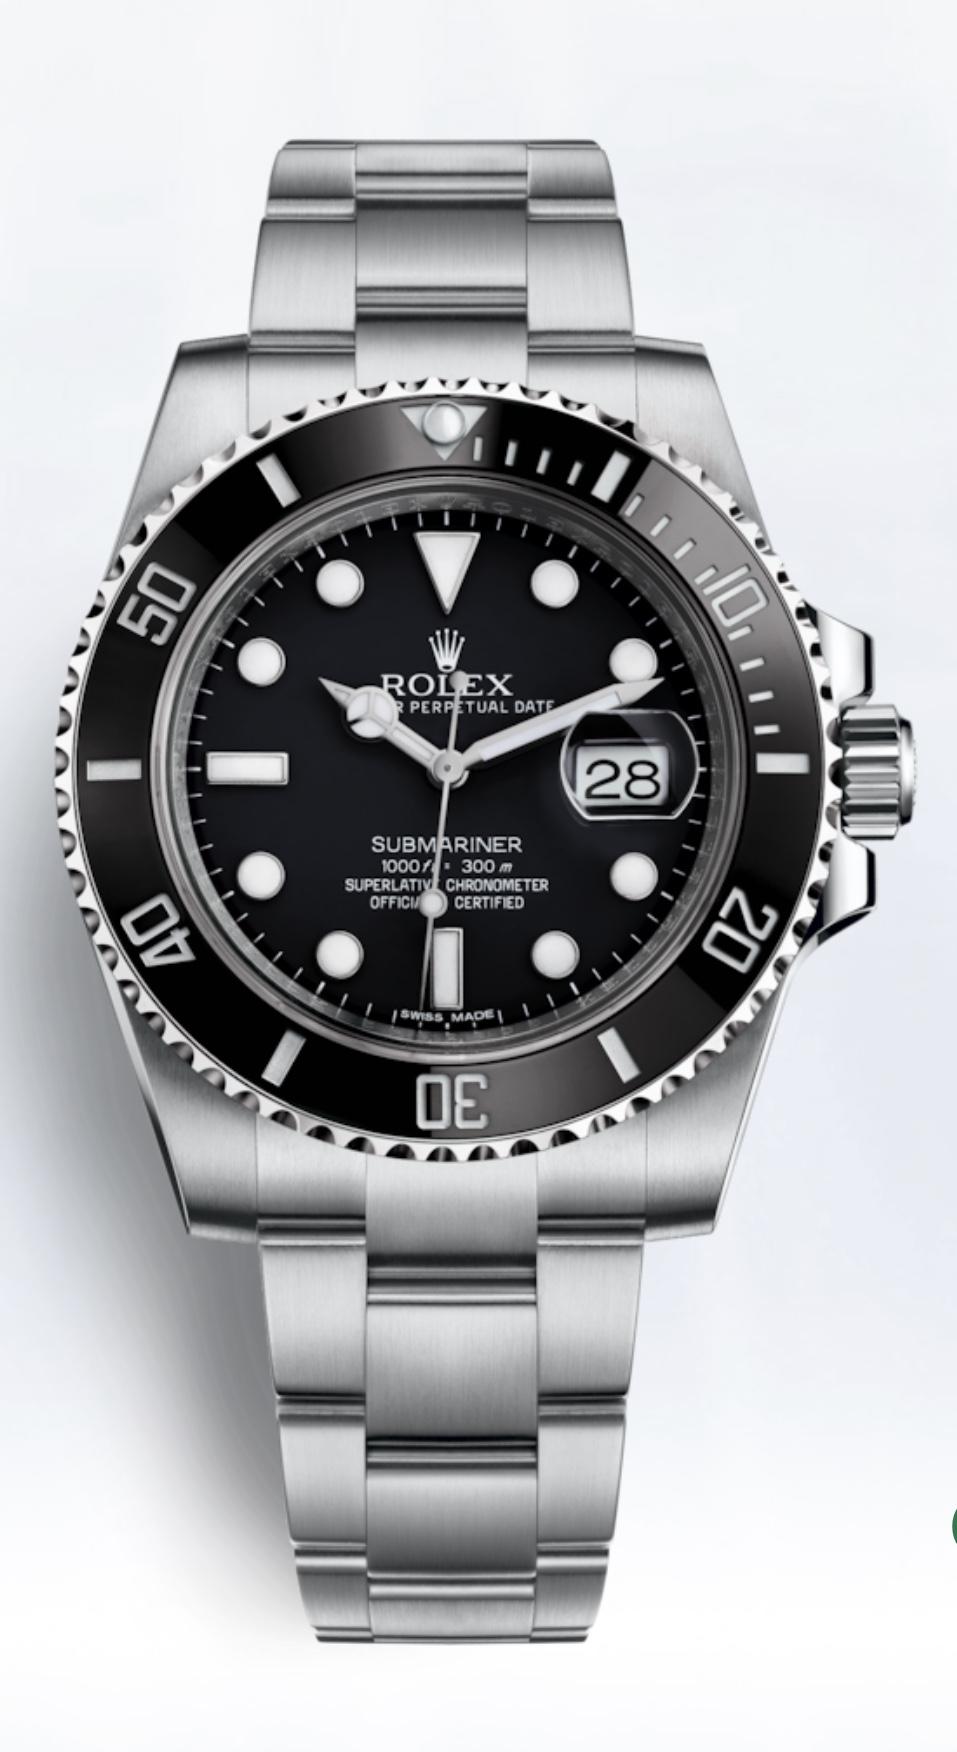 Rolex Submariner Date ou Hublot Classic Fusion Chronograph ? 33c42510